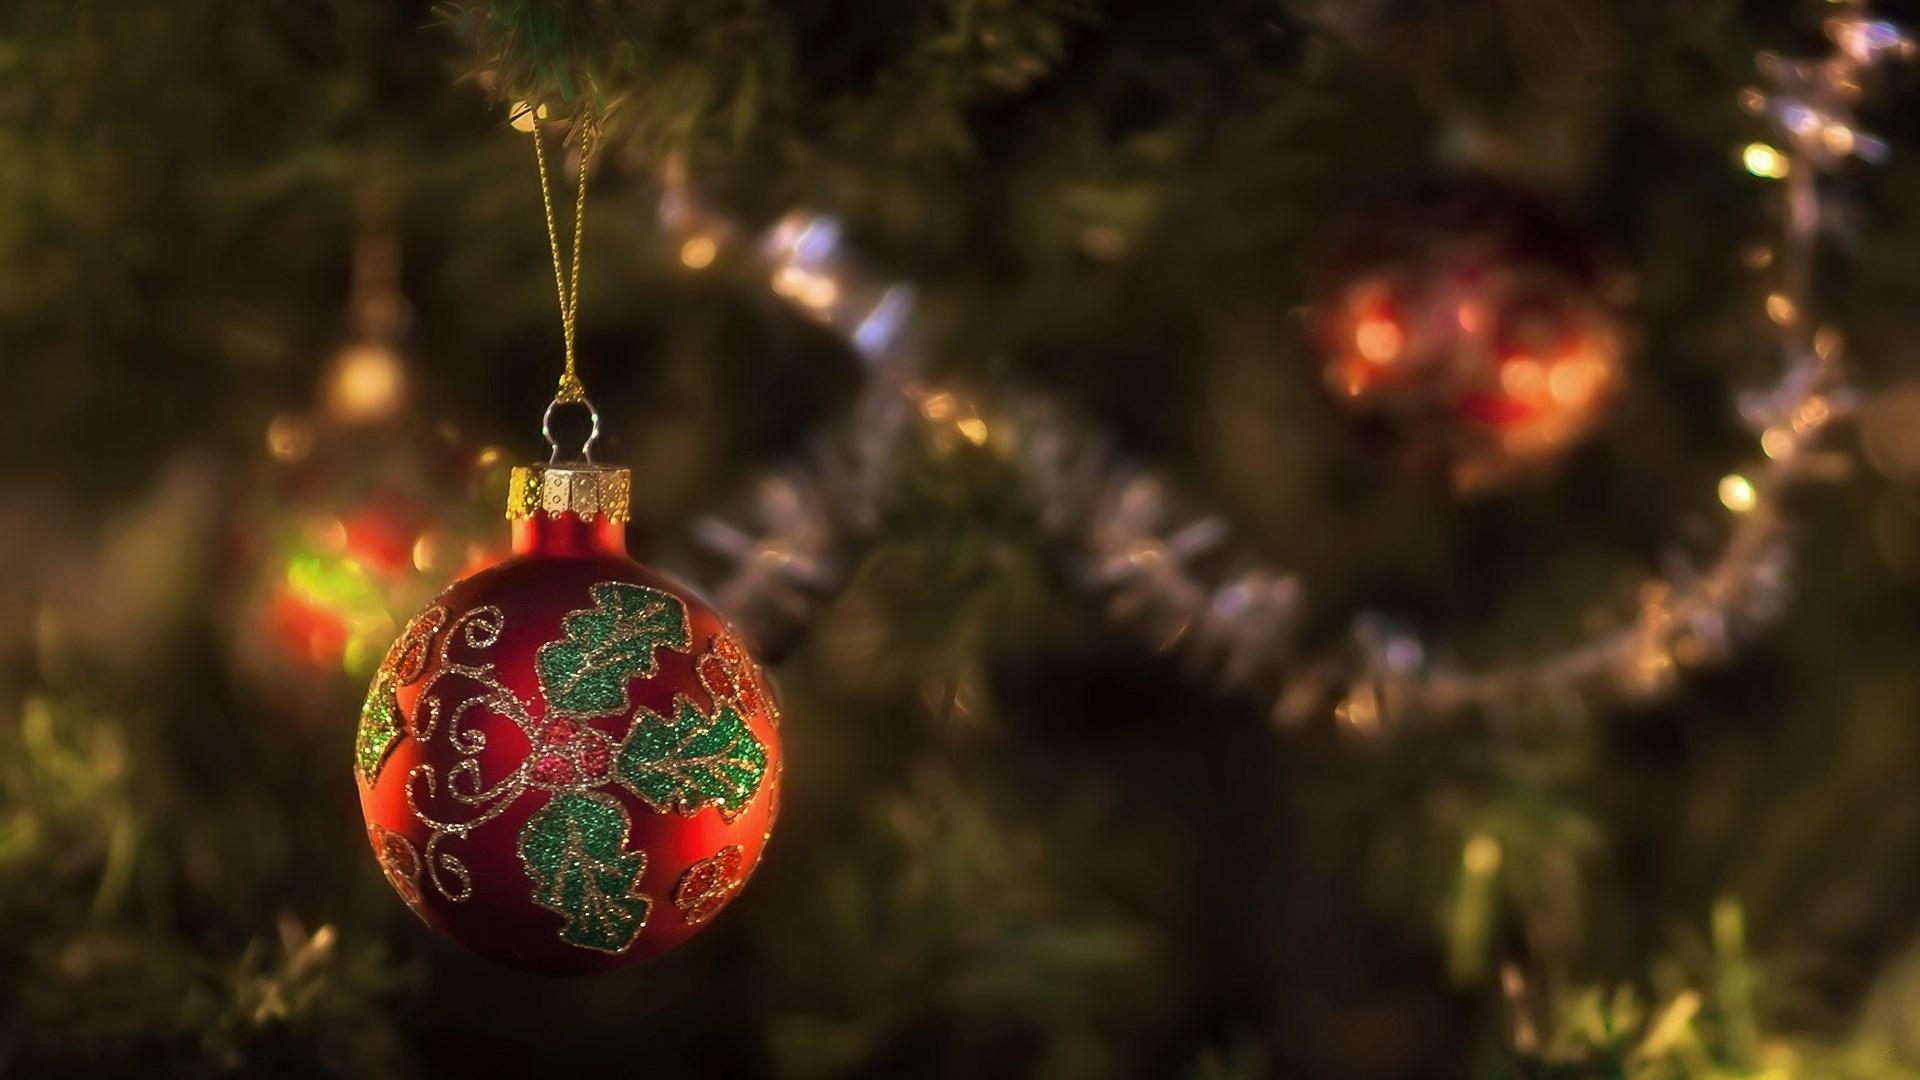 Spruce Fir Tree New Year Christmas Ball